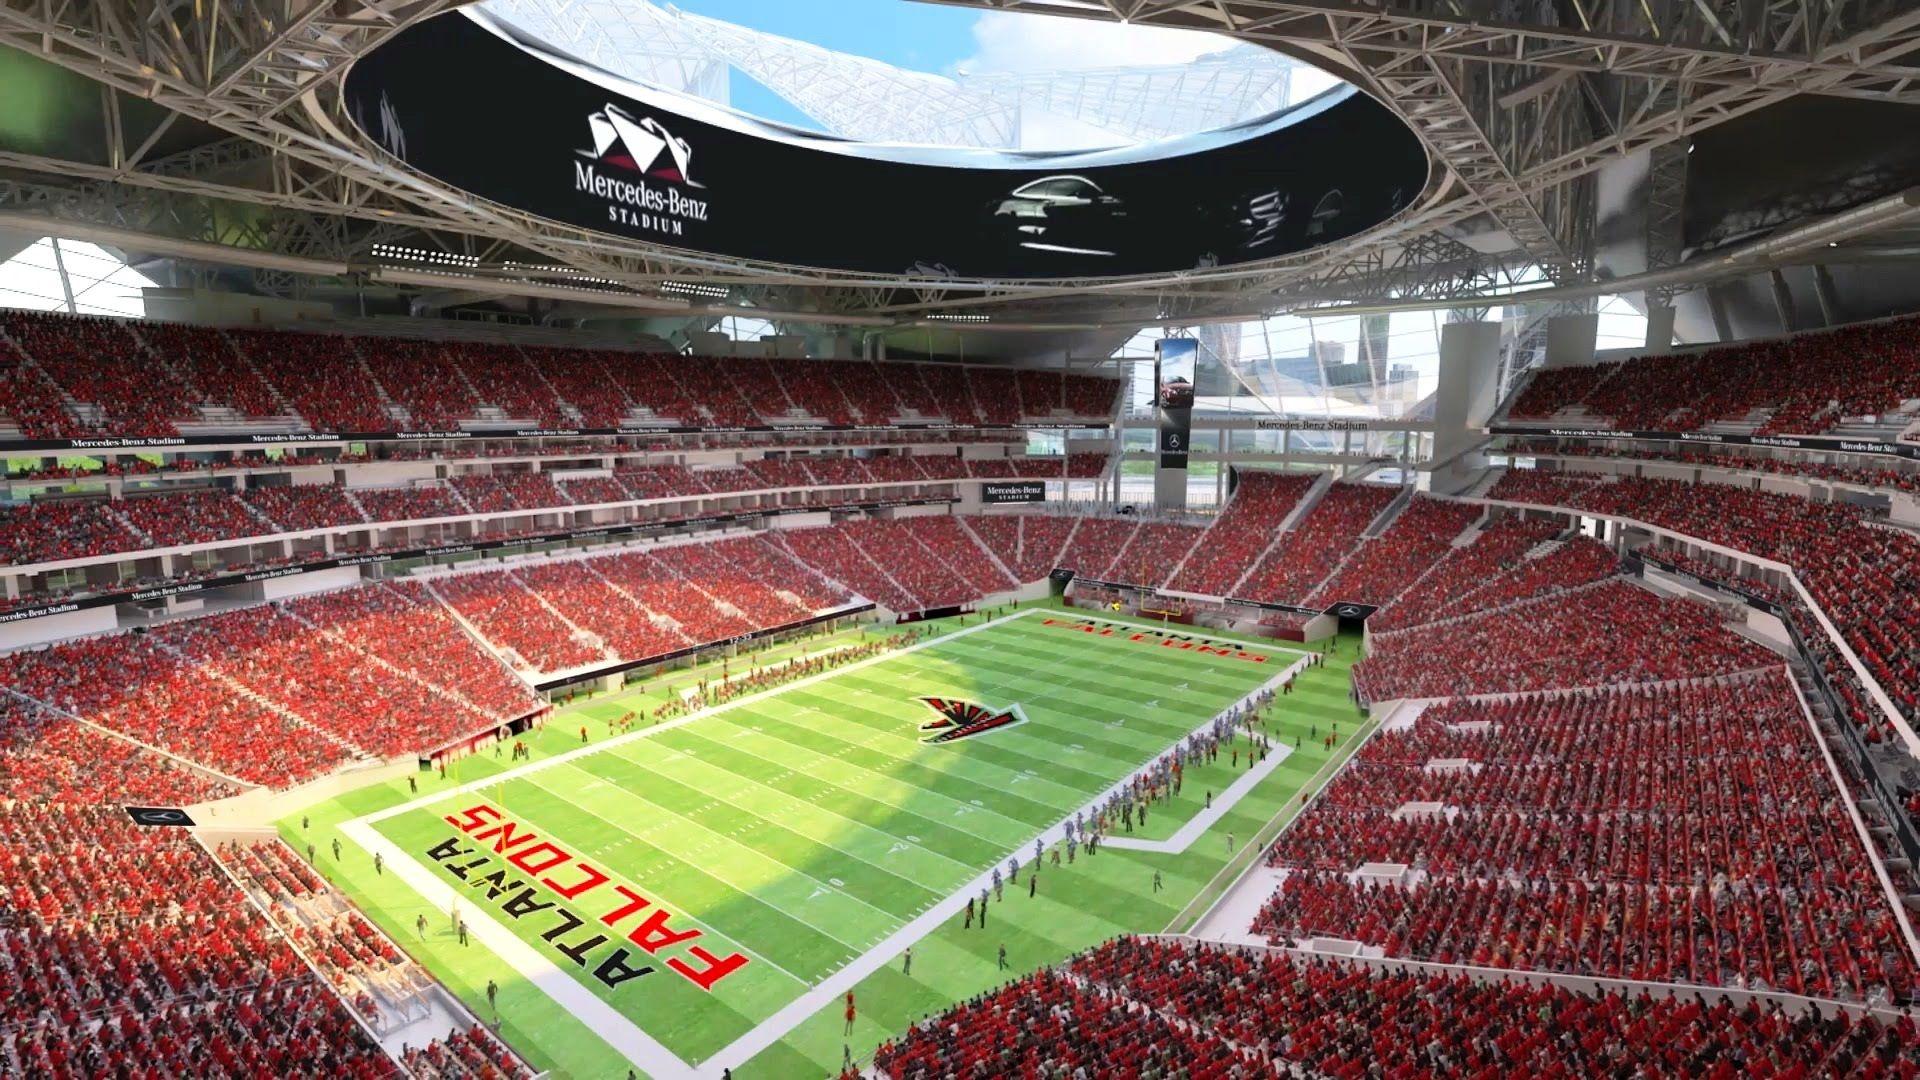 Mercedes Benz Tv The New Mercedes Benz Stadium In Atlanta Atlanta Falcons Football New Atlanta Atlanta Falcons